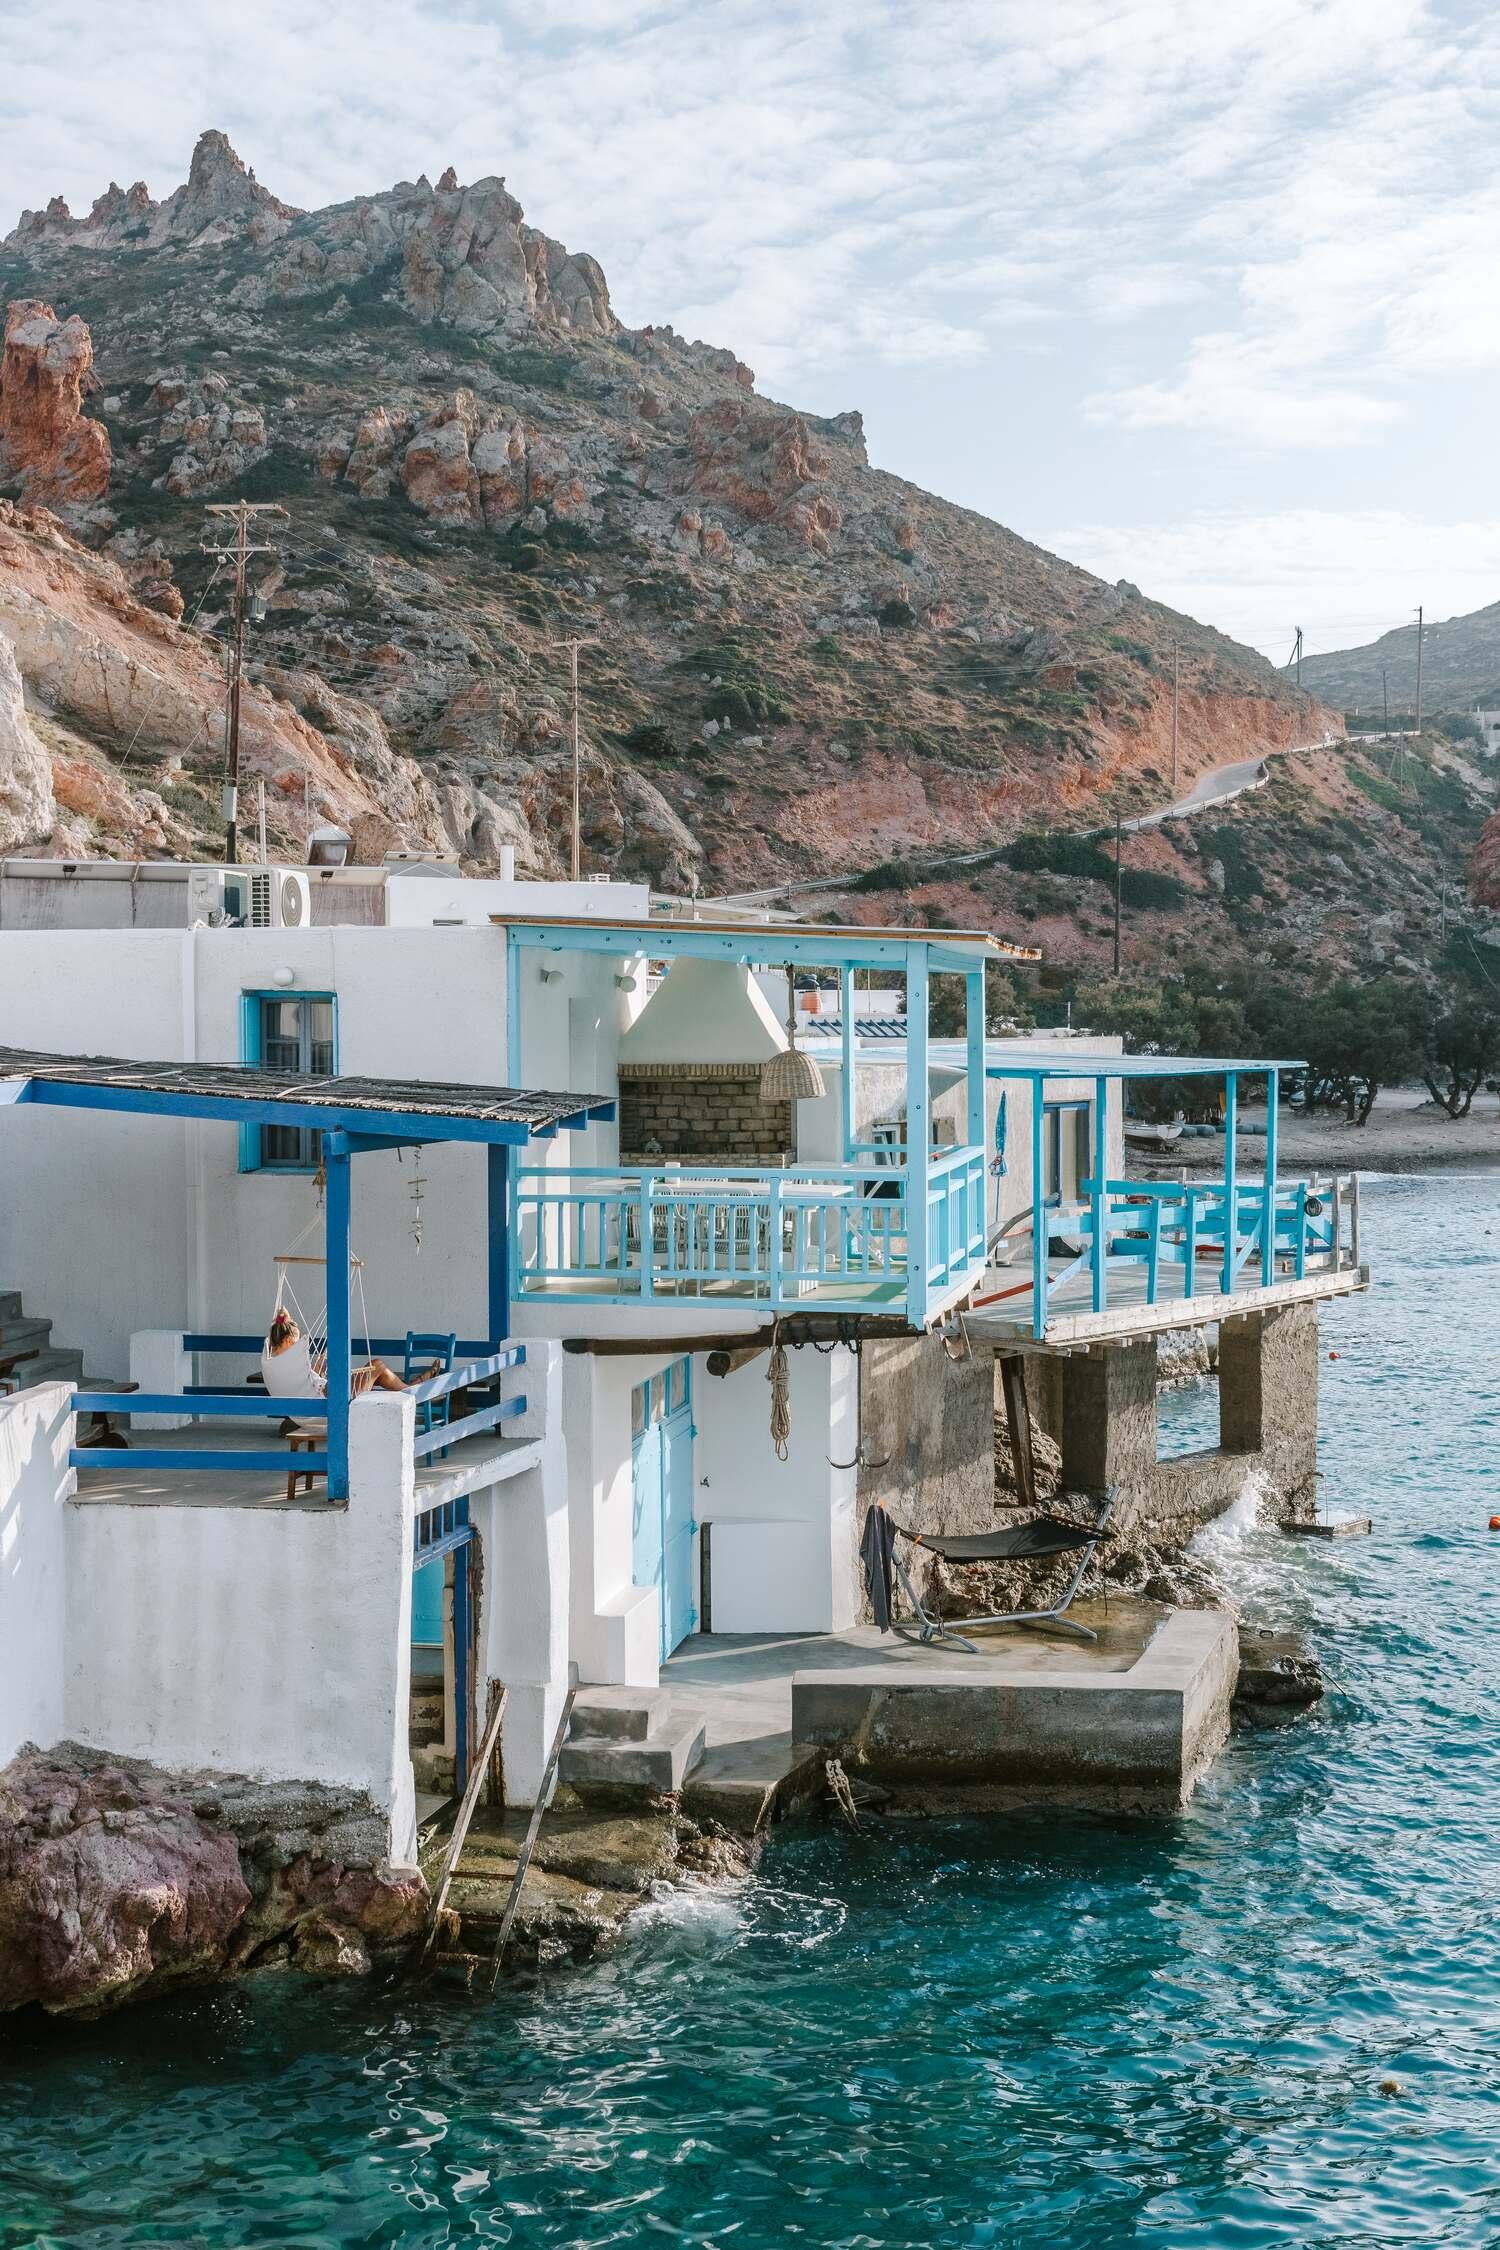 The beautiful small fishing village of Firopotamos on the Greek island of Milos